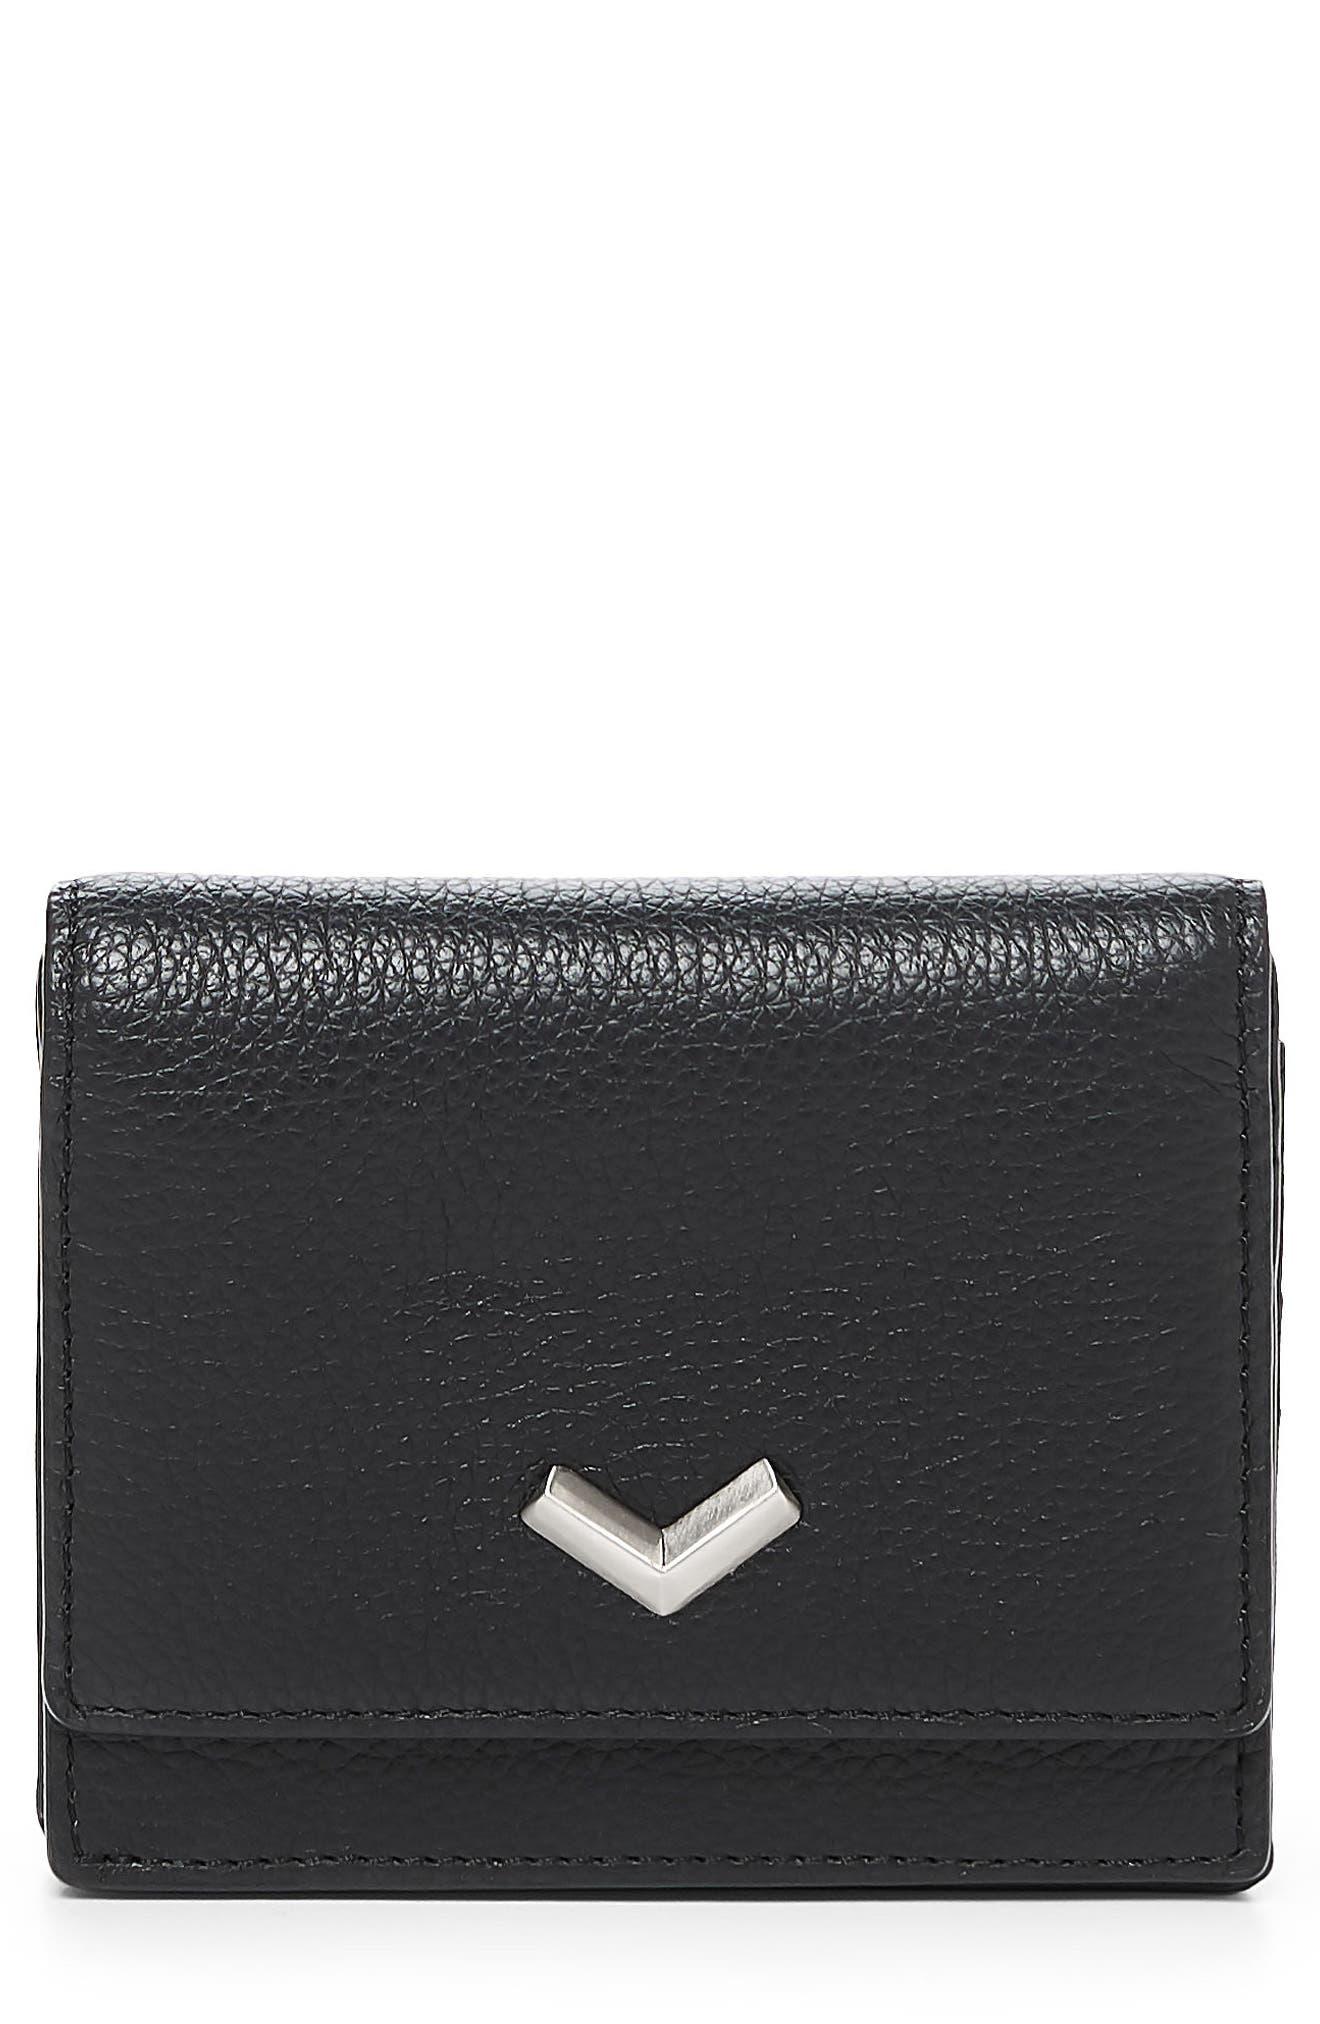 Soho Mini Leather Wallet,                             Main thumbnail 1, color,                             001